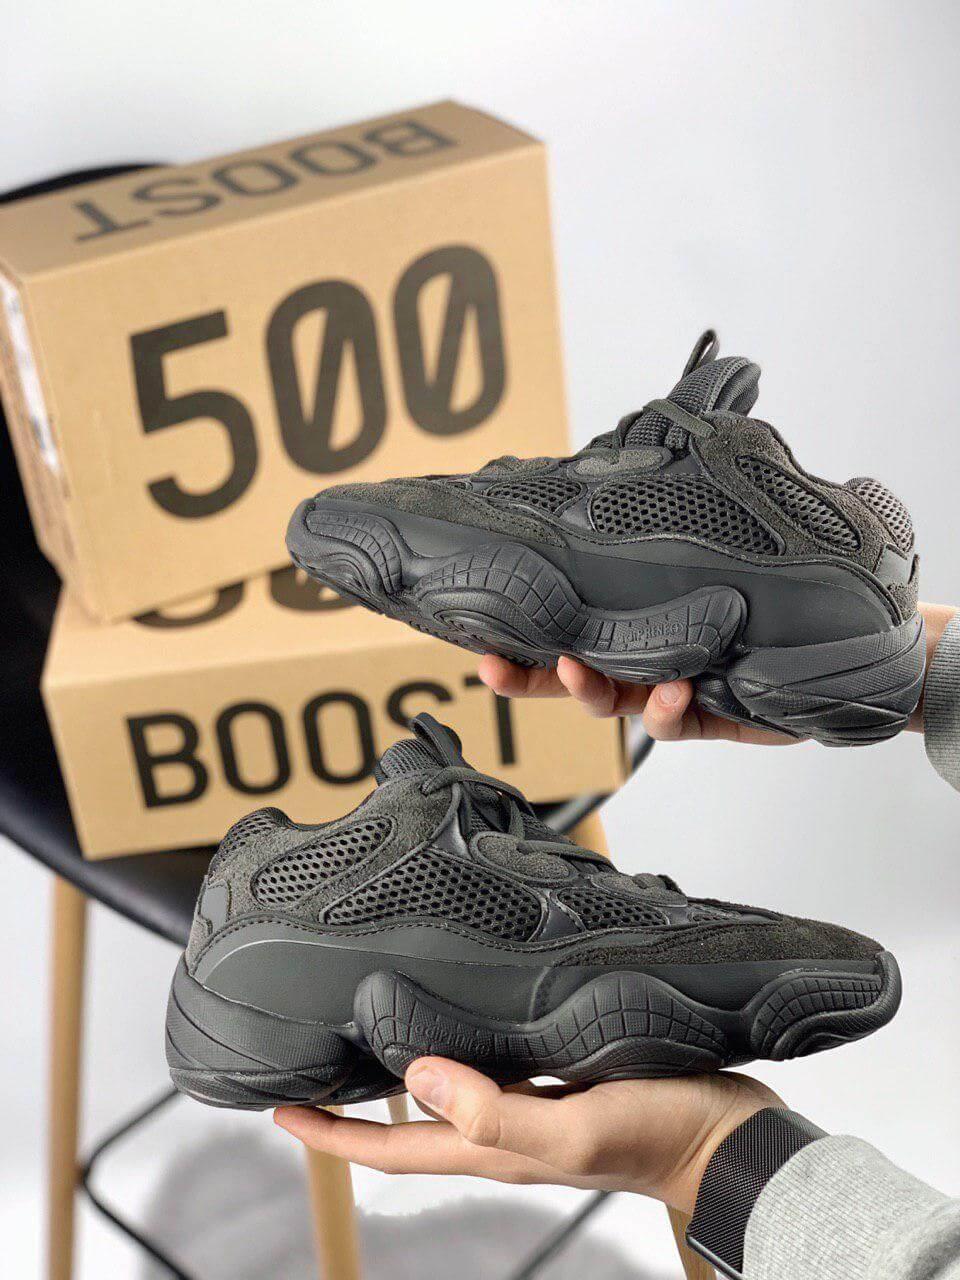 2bc3d6f0 Кроссовки Adidas Yeezy 500 Black - Интернет магазин обуви «im-РоLLi» в Киеве